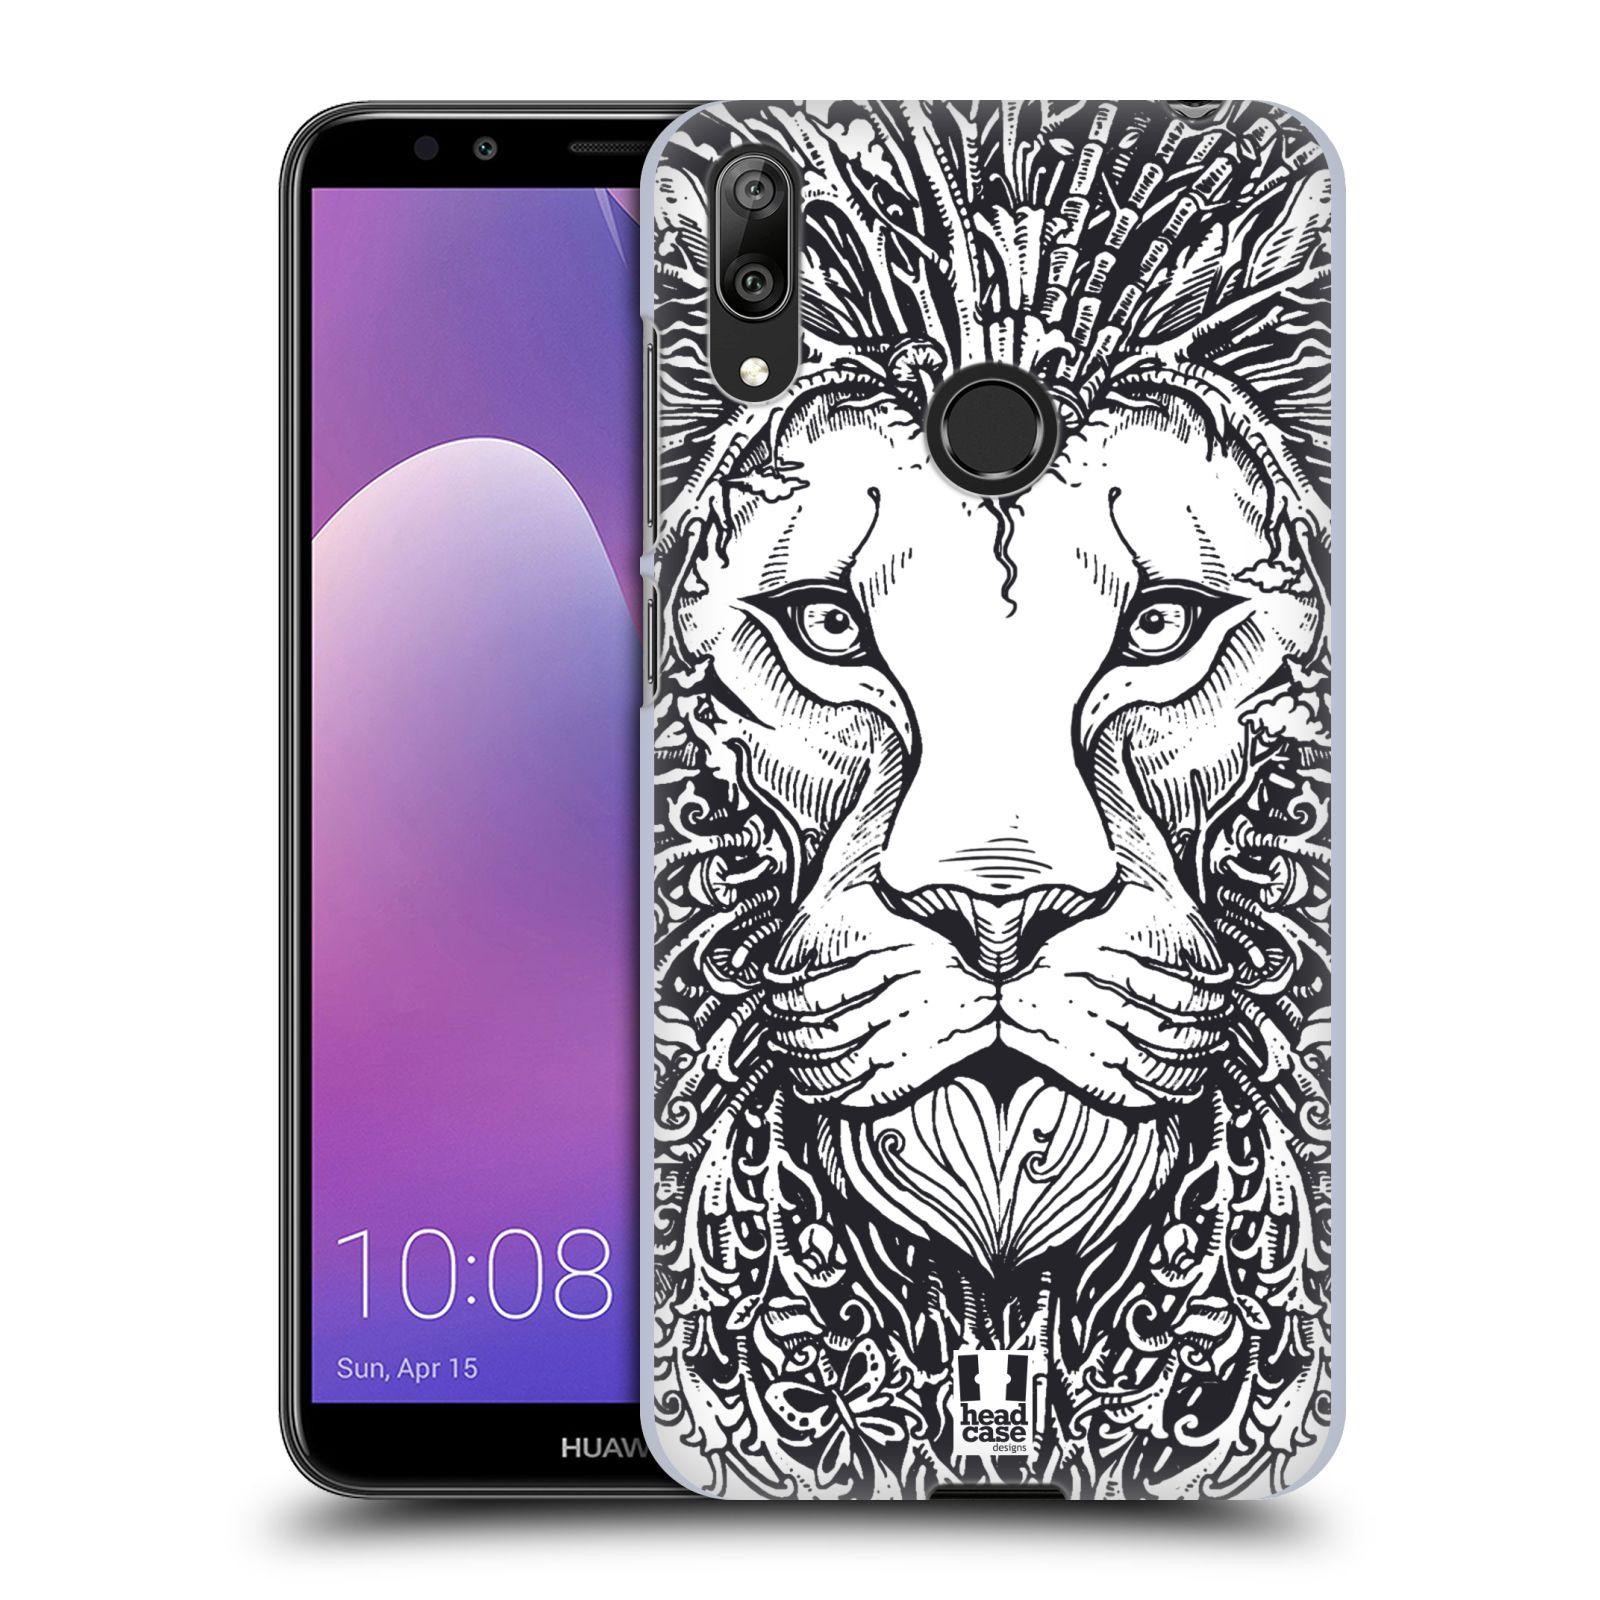 Plastové pouzdro na mobil Huawei Y7 (2019) - Head Case - DOODLE TVÁŘ LEV